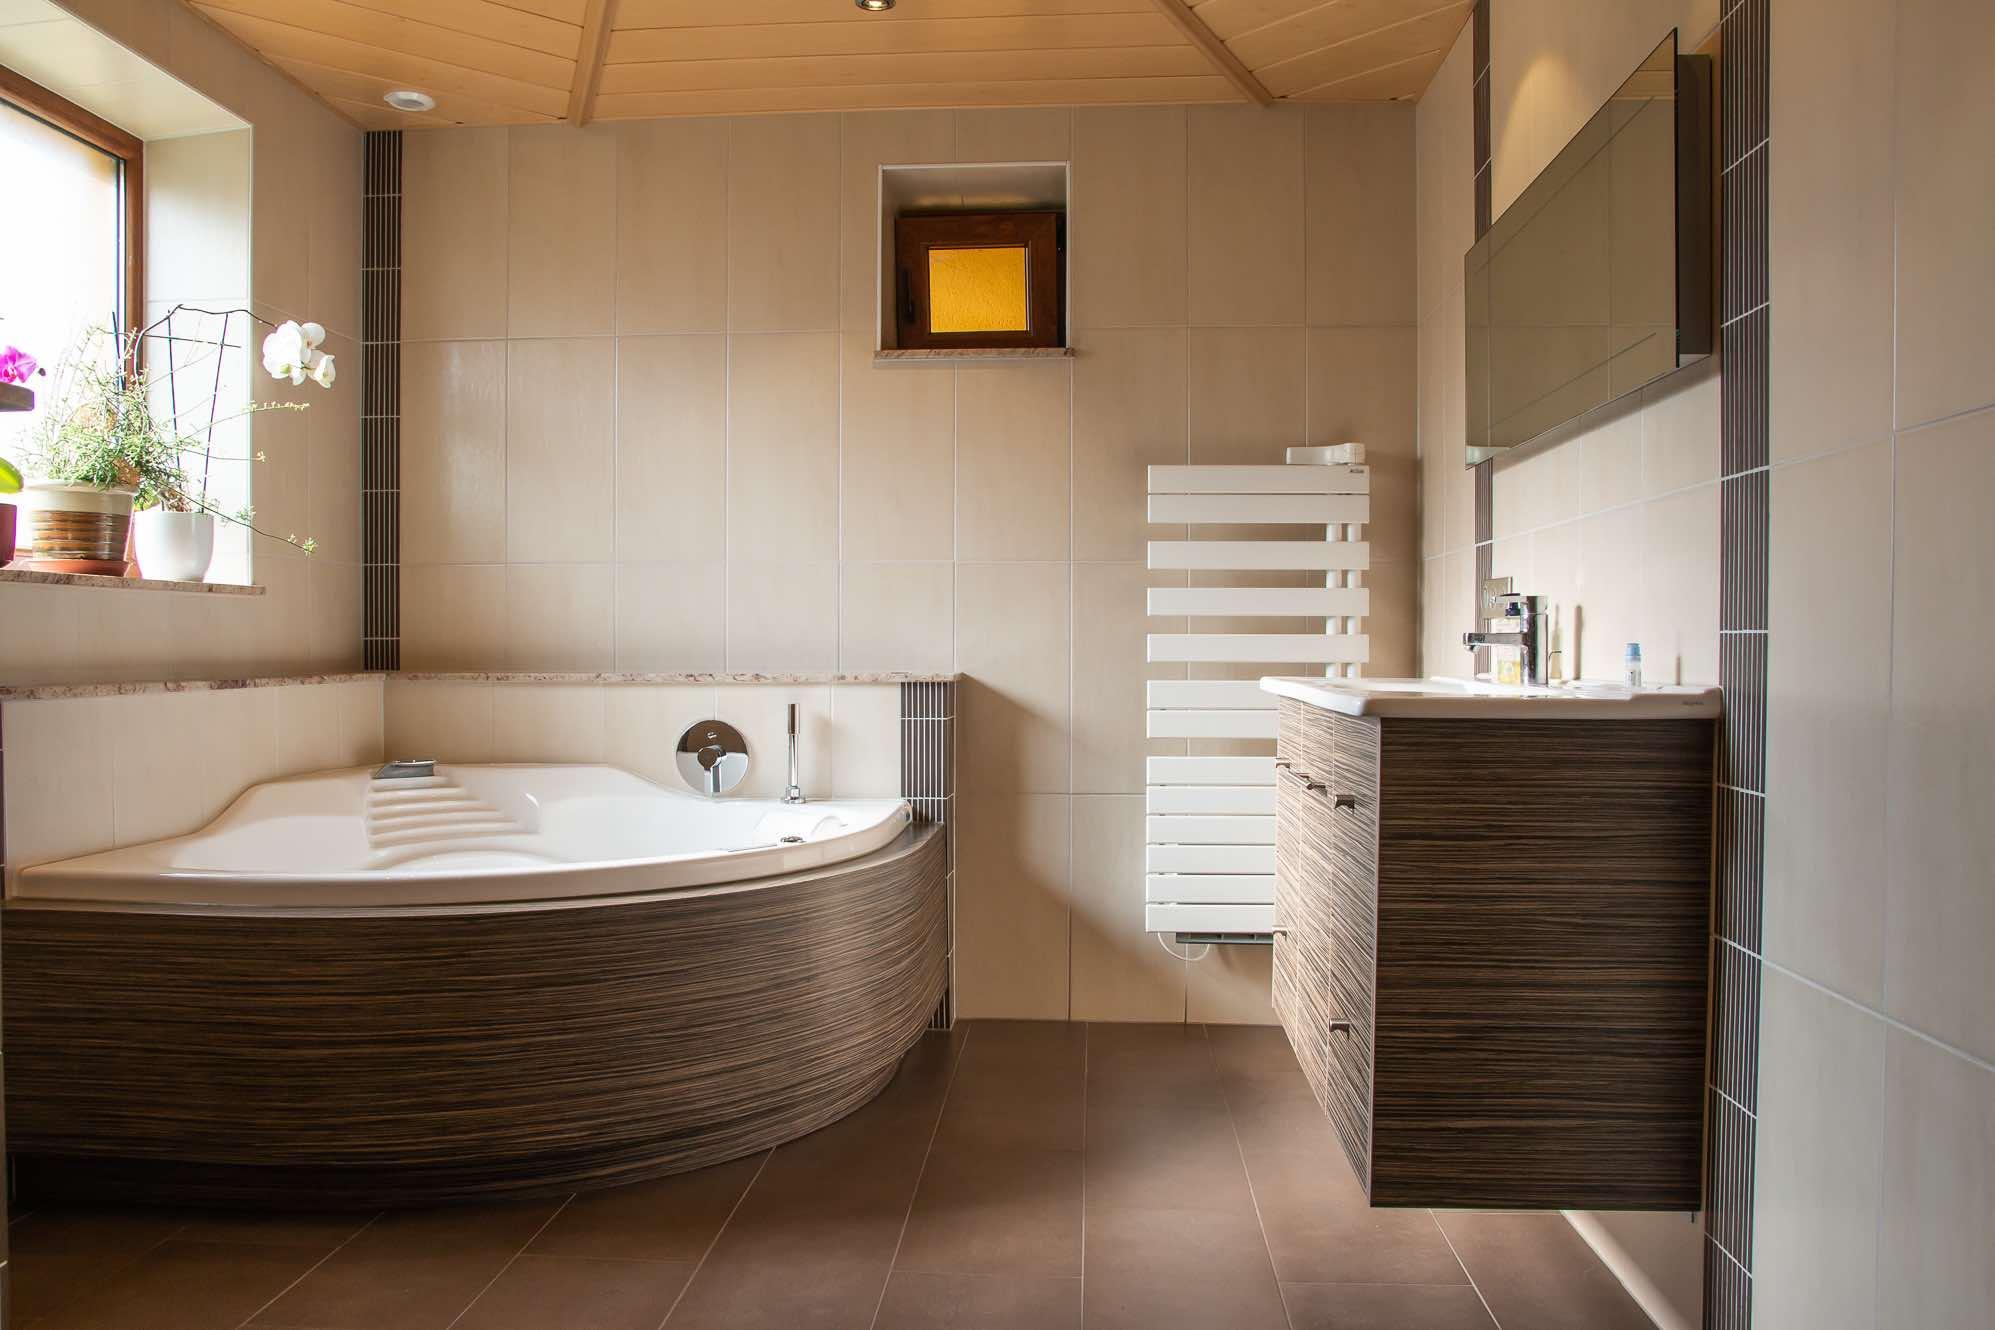 agencement meuble habillage salle de bain bas rhin